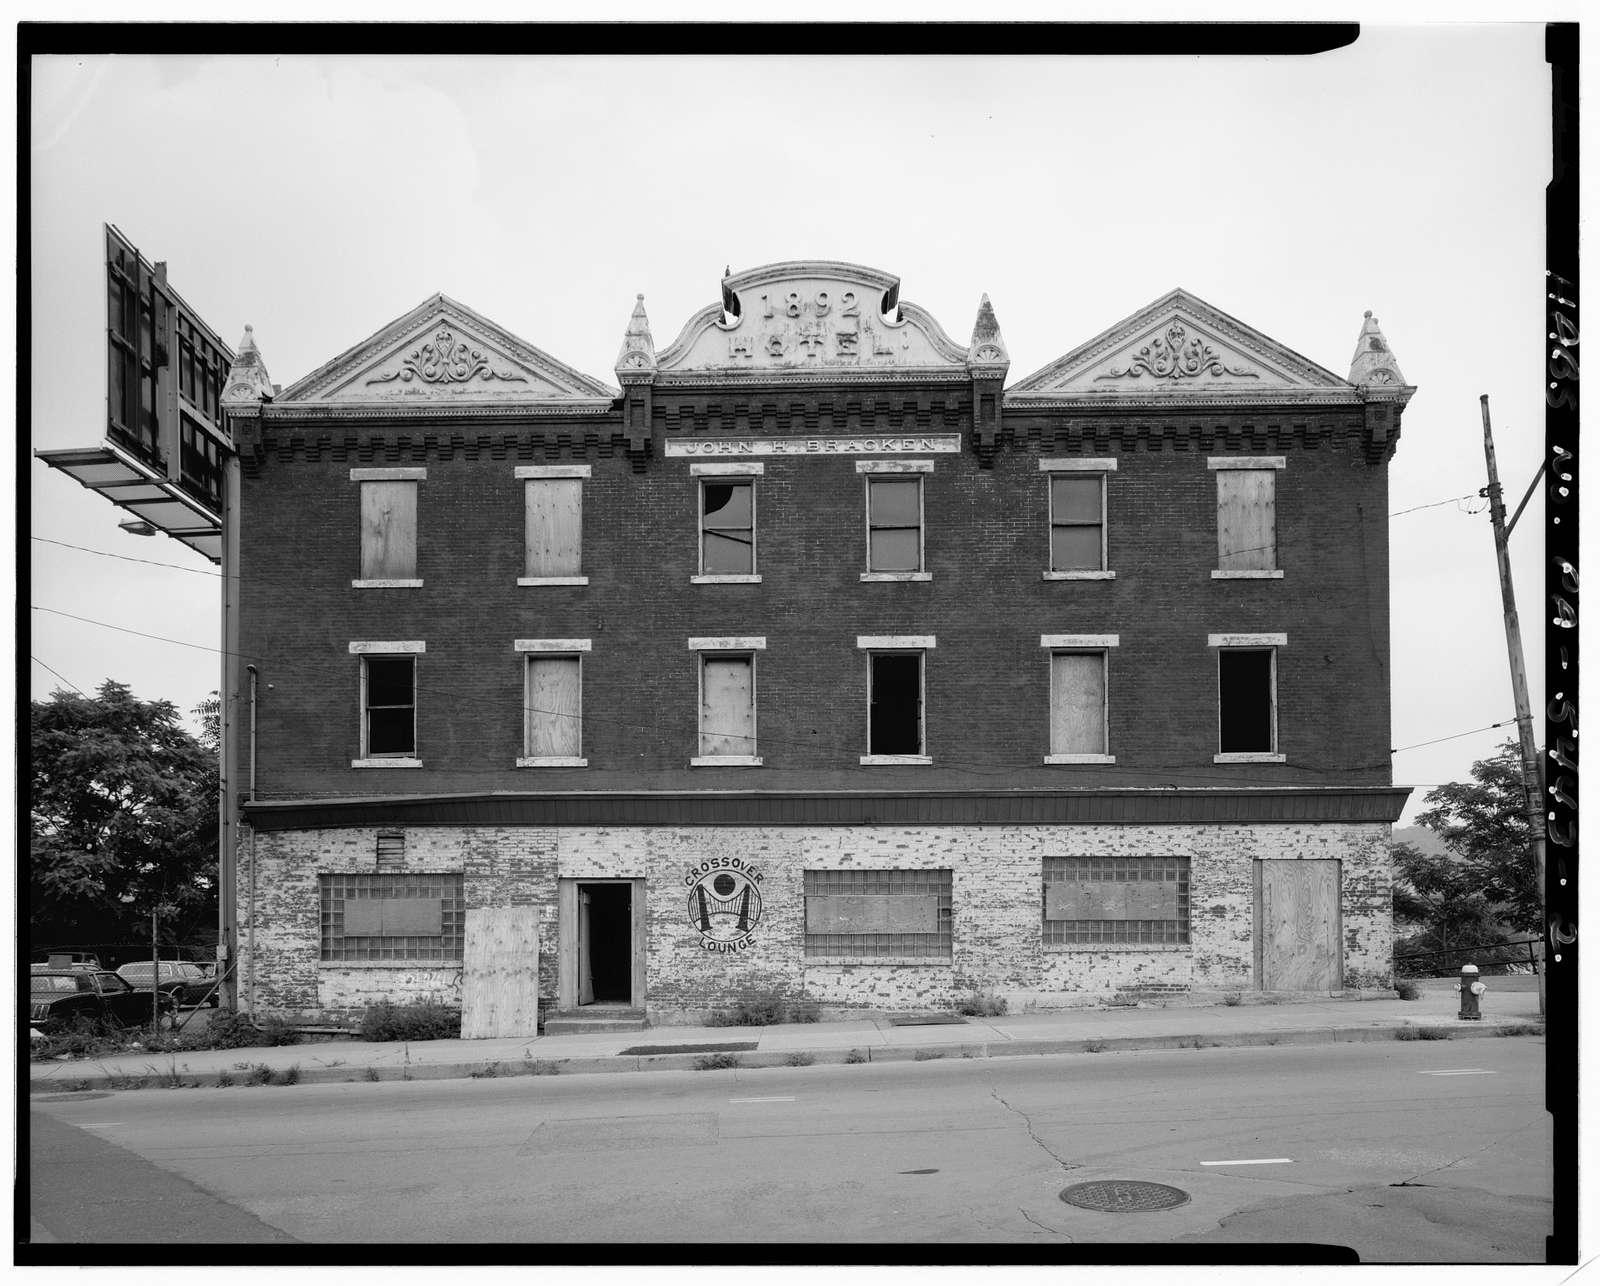 John M. Bracken Hotel, 100-104 Anderson Street, Pittsburgh, Allegheny County, PA